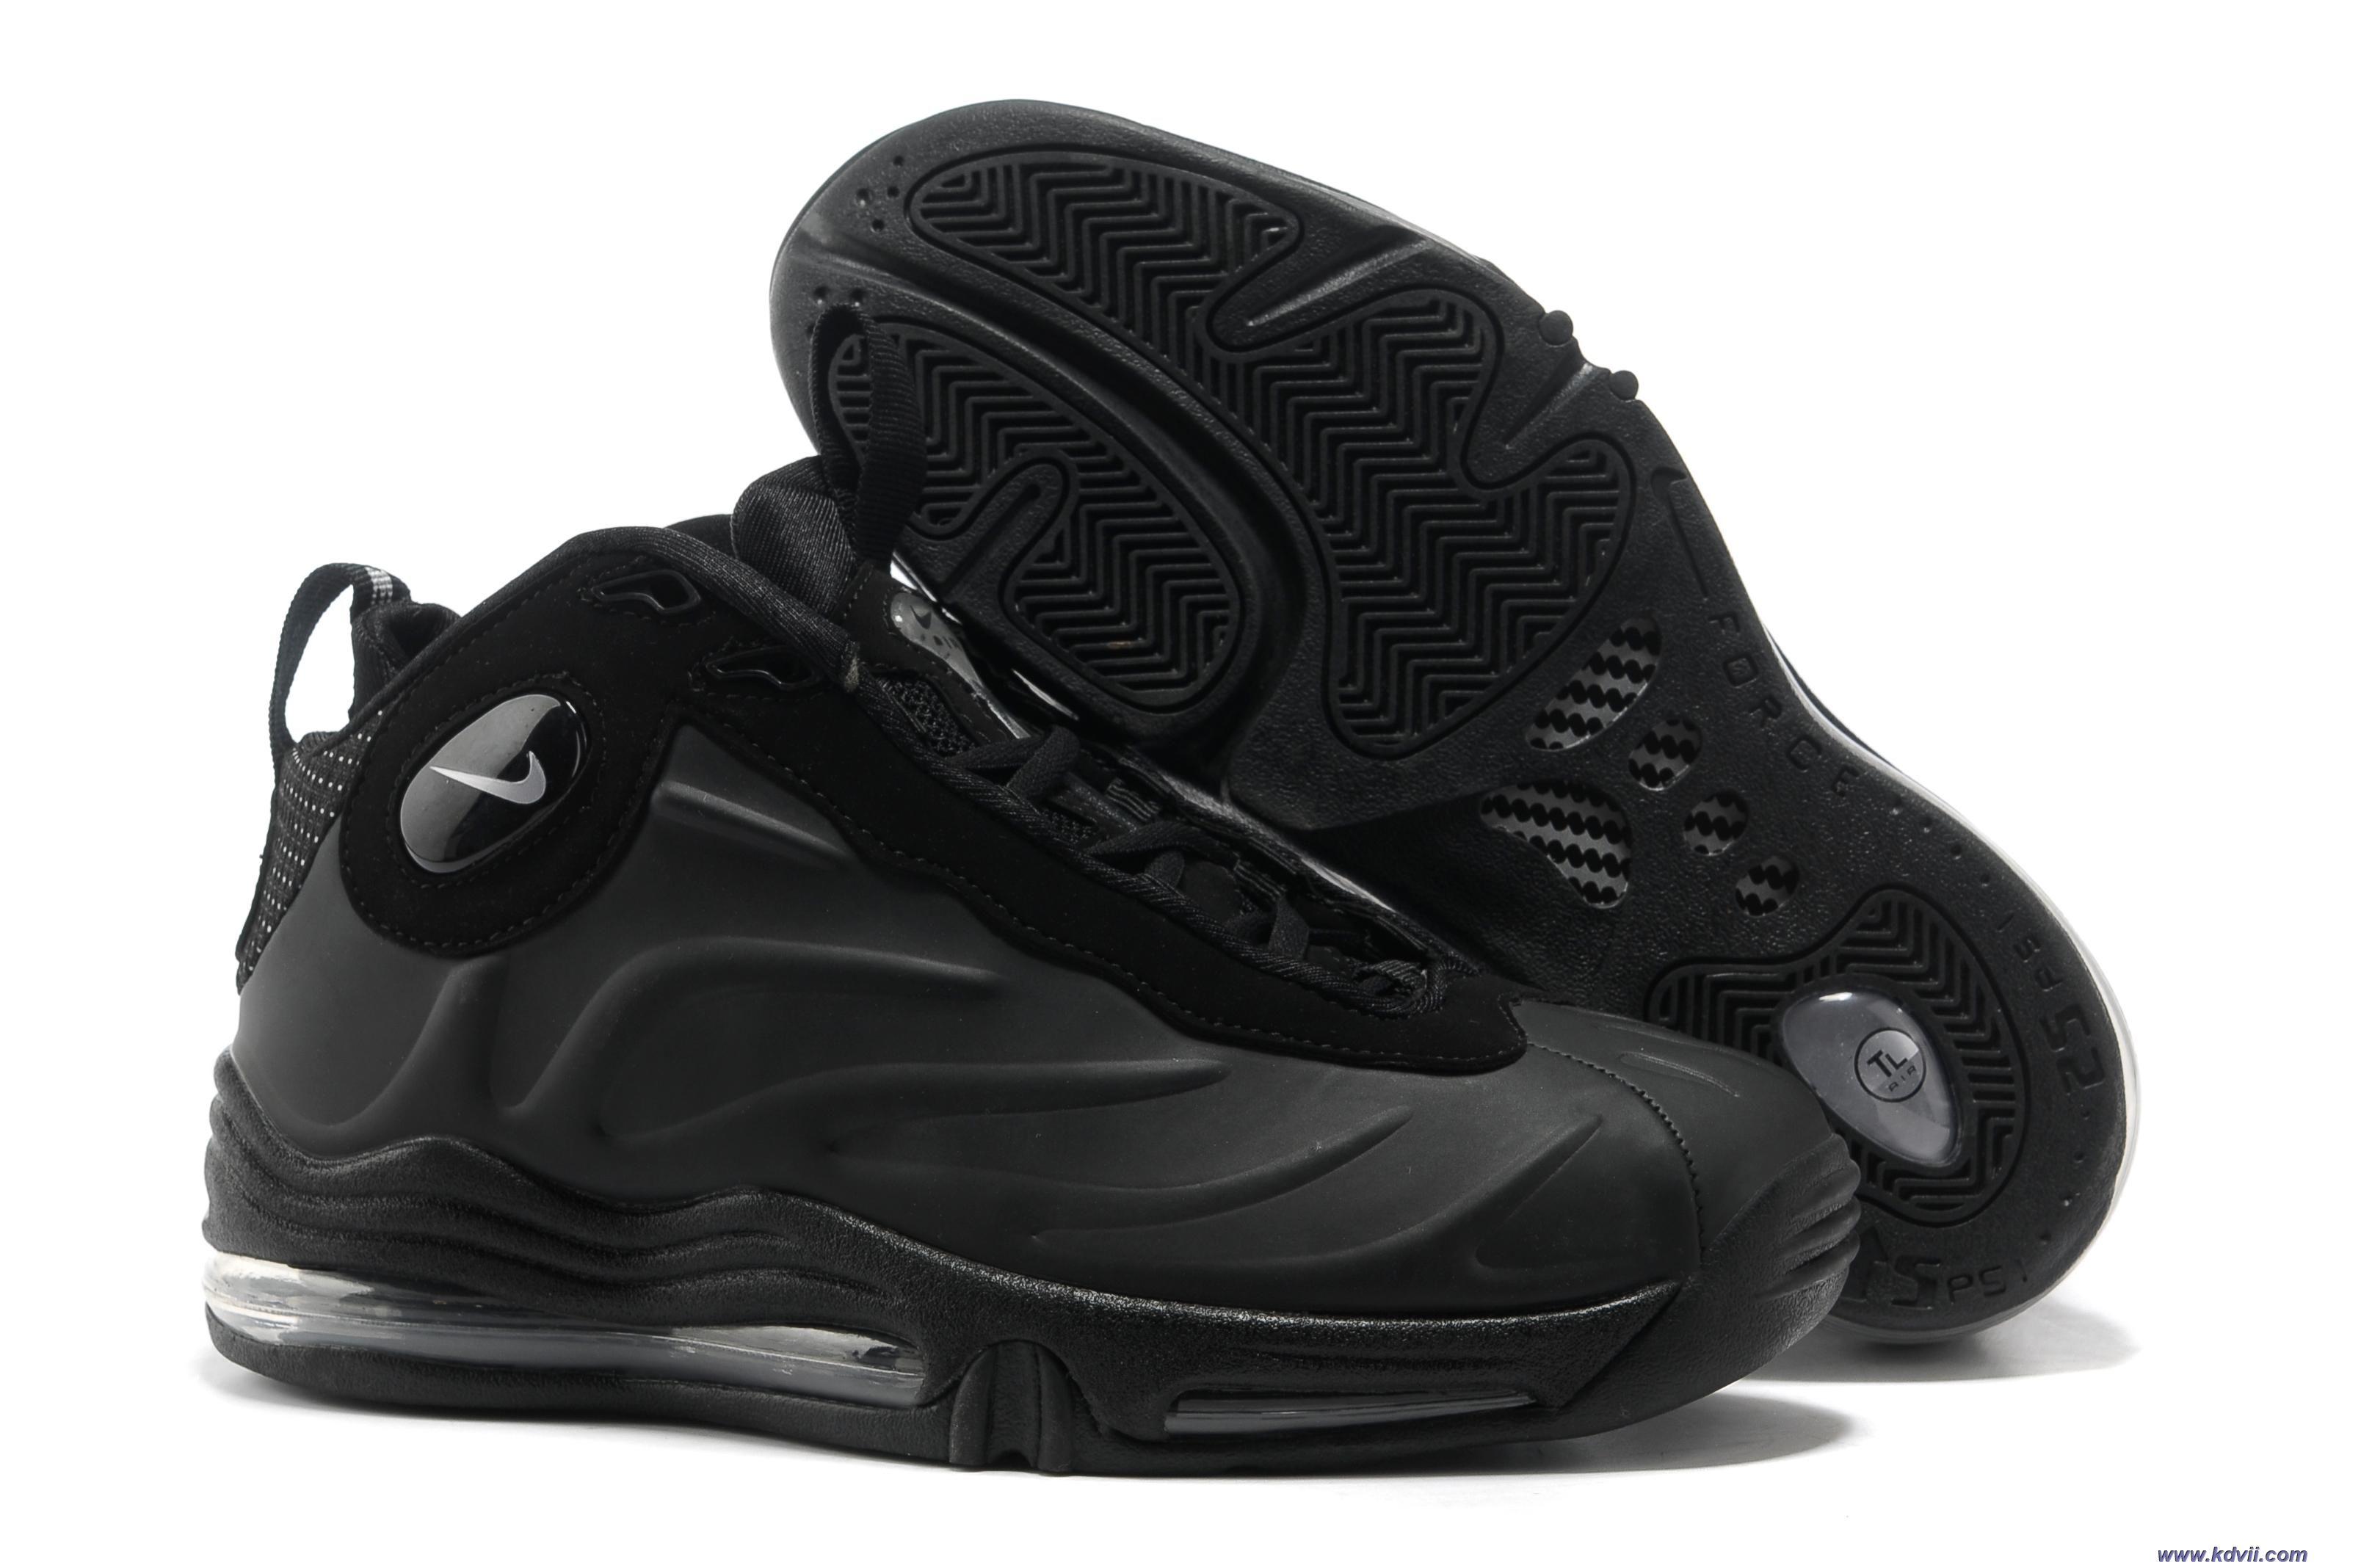 931fd29cd1a5c Black Black-Anthracite Nike Air Total Foamposite Max Sale